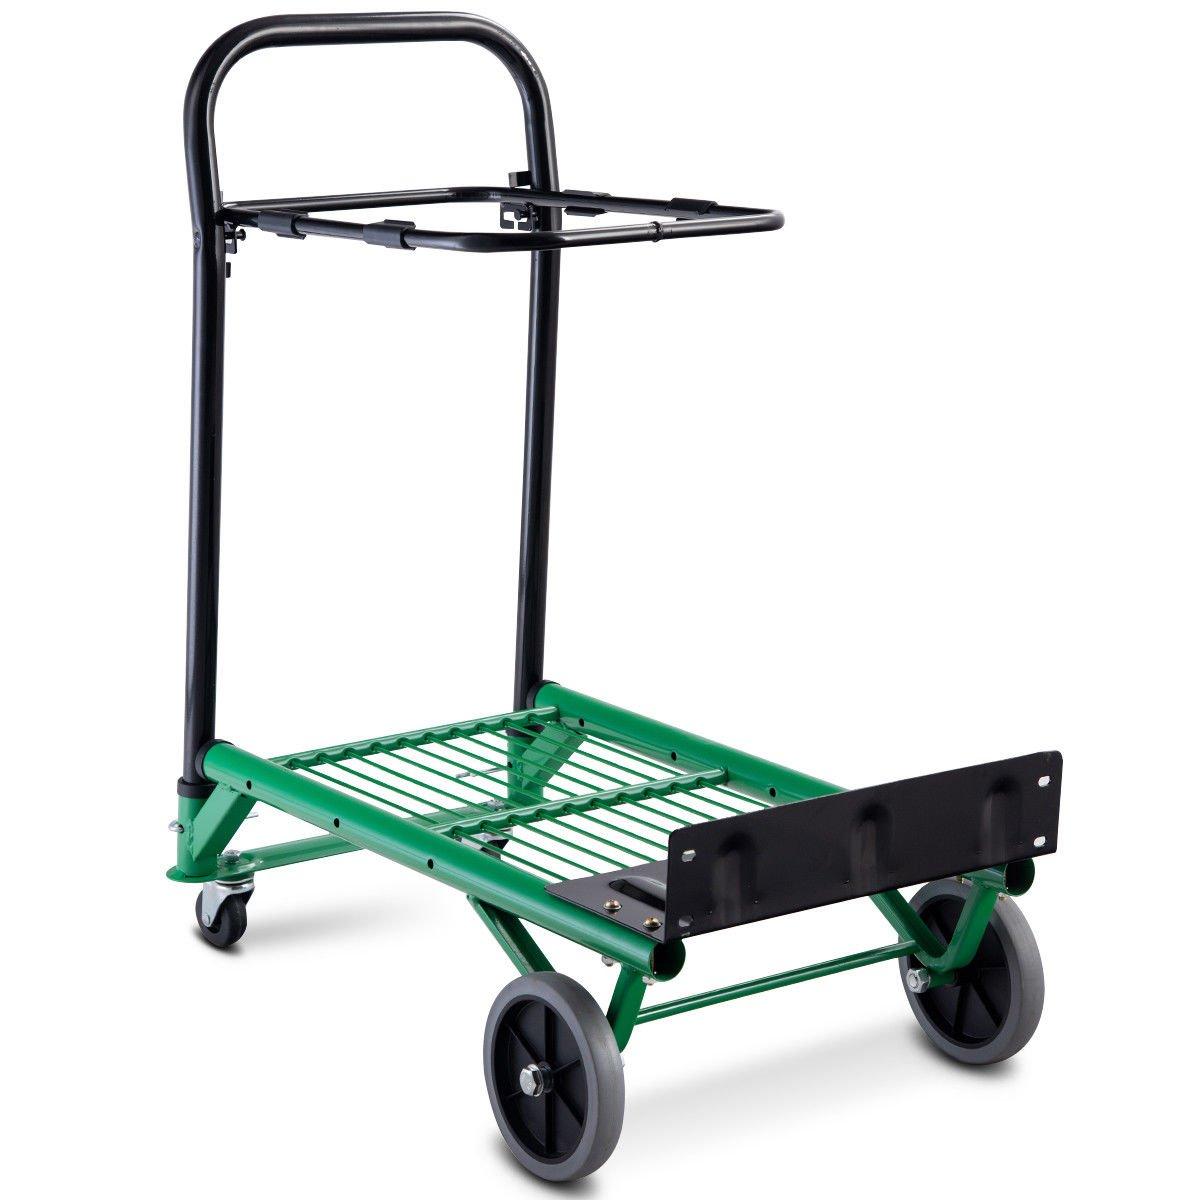 Green 2-in-1 Convertible Platform Hand Truck Garden Dolly Cart Folding Heavy Duty Warehouse Transport Loads(U.S. Stock) by Heize best price (Image #1)